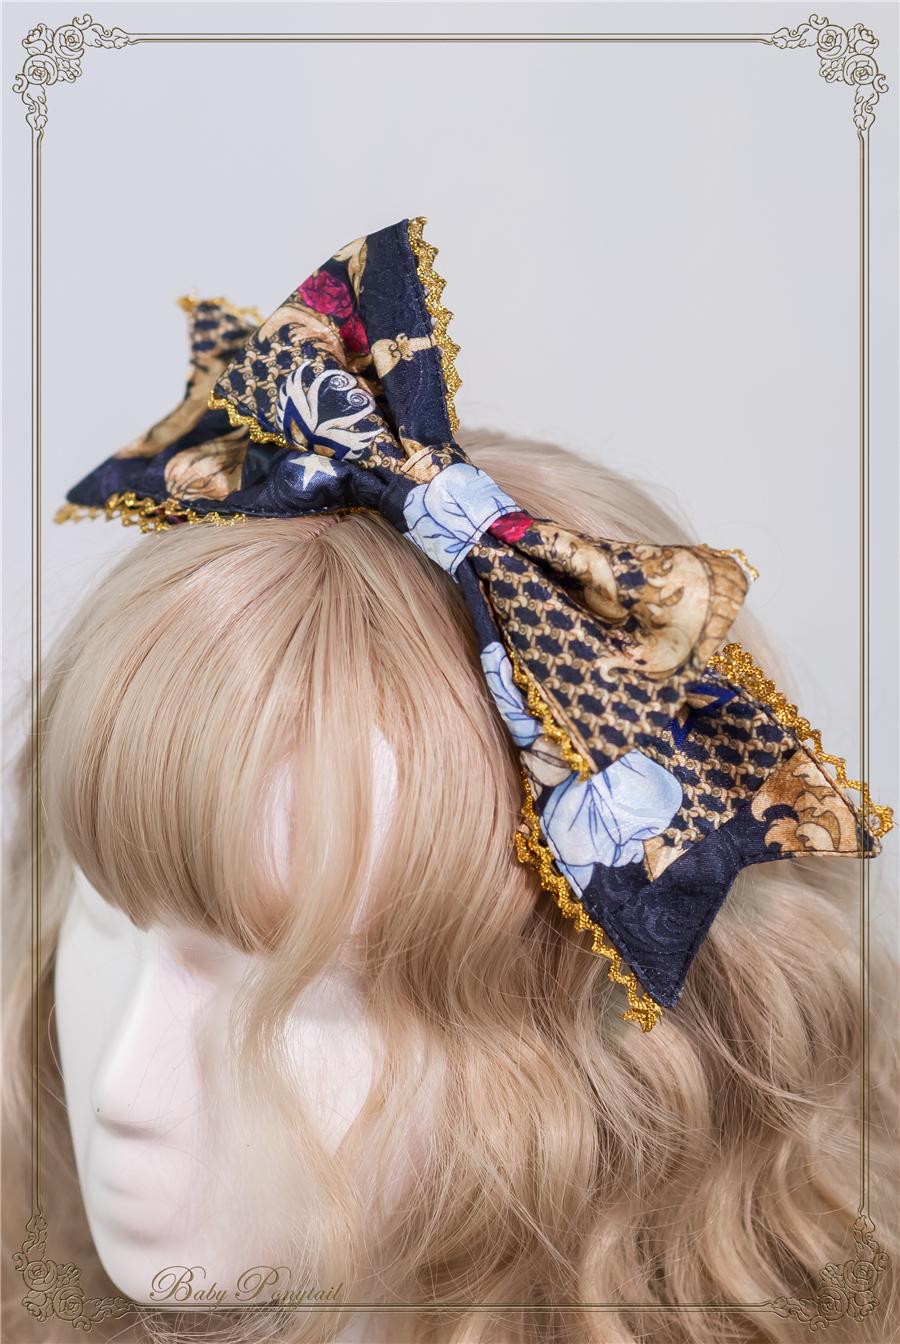 Baby Ponytail_Stock photo_Circus Princess_KC Black_06.jpg